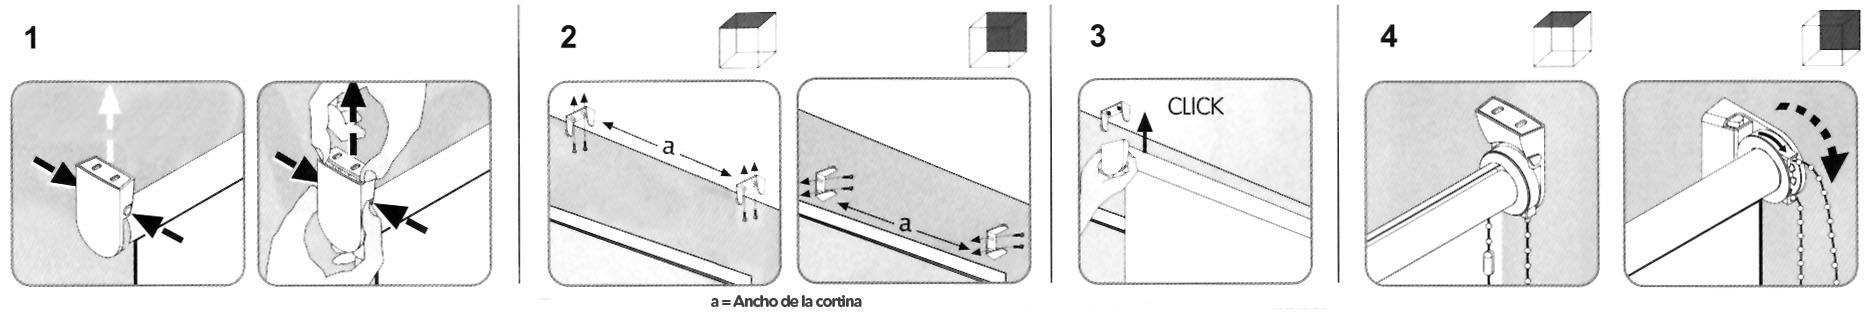 instrucciones_enrollables_viewtex.jpg